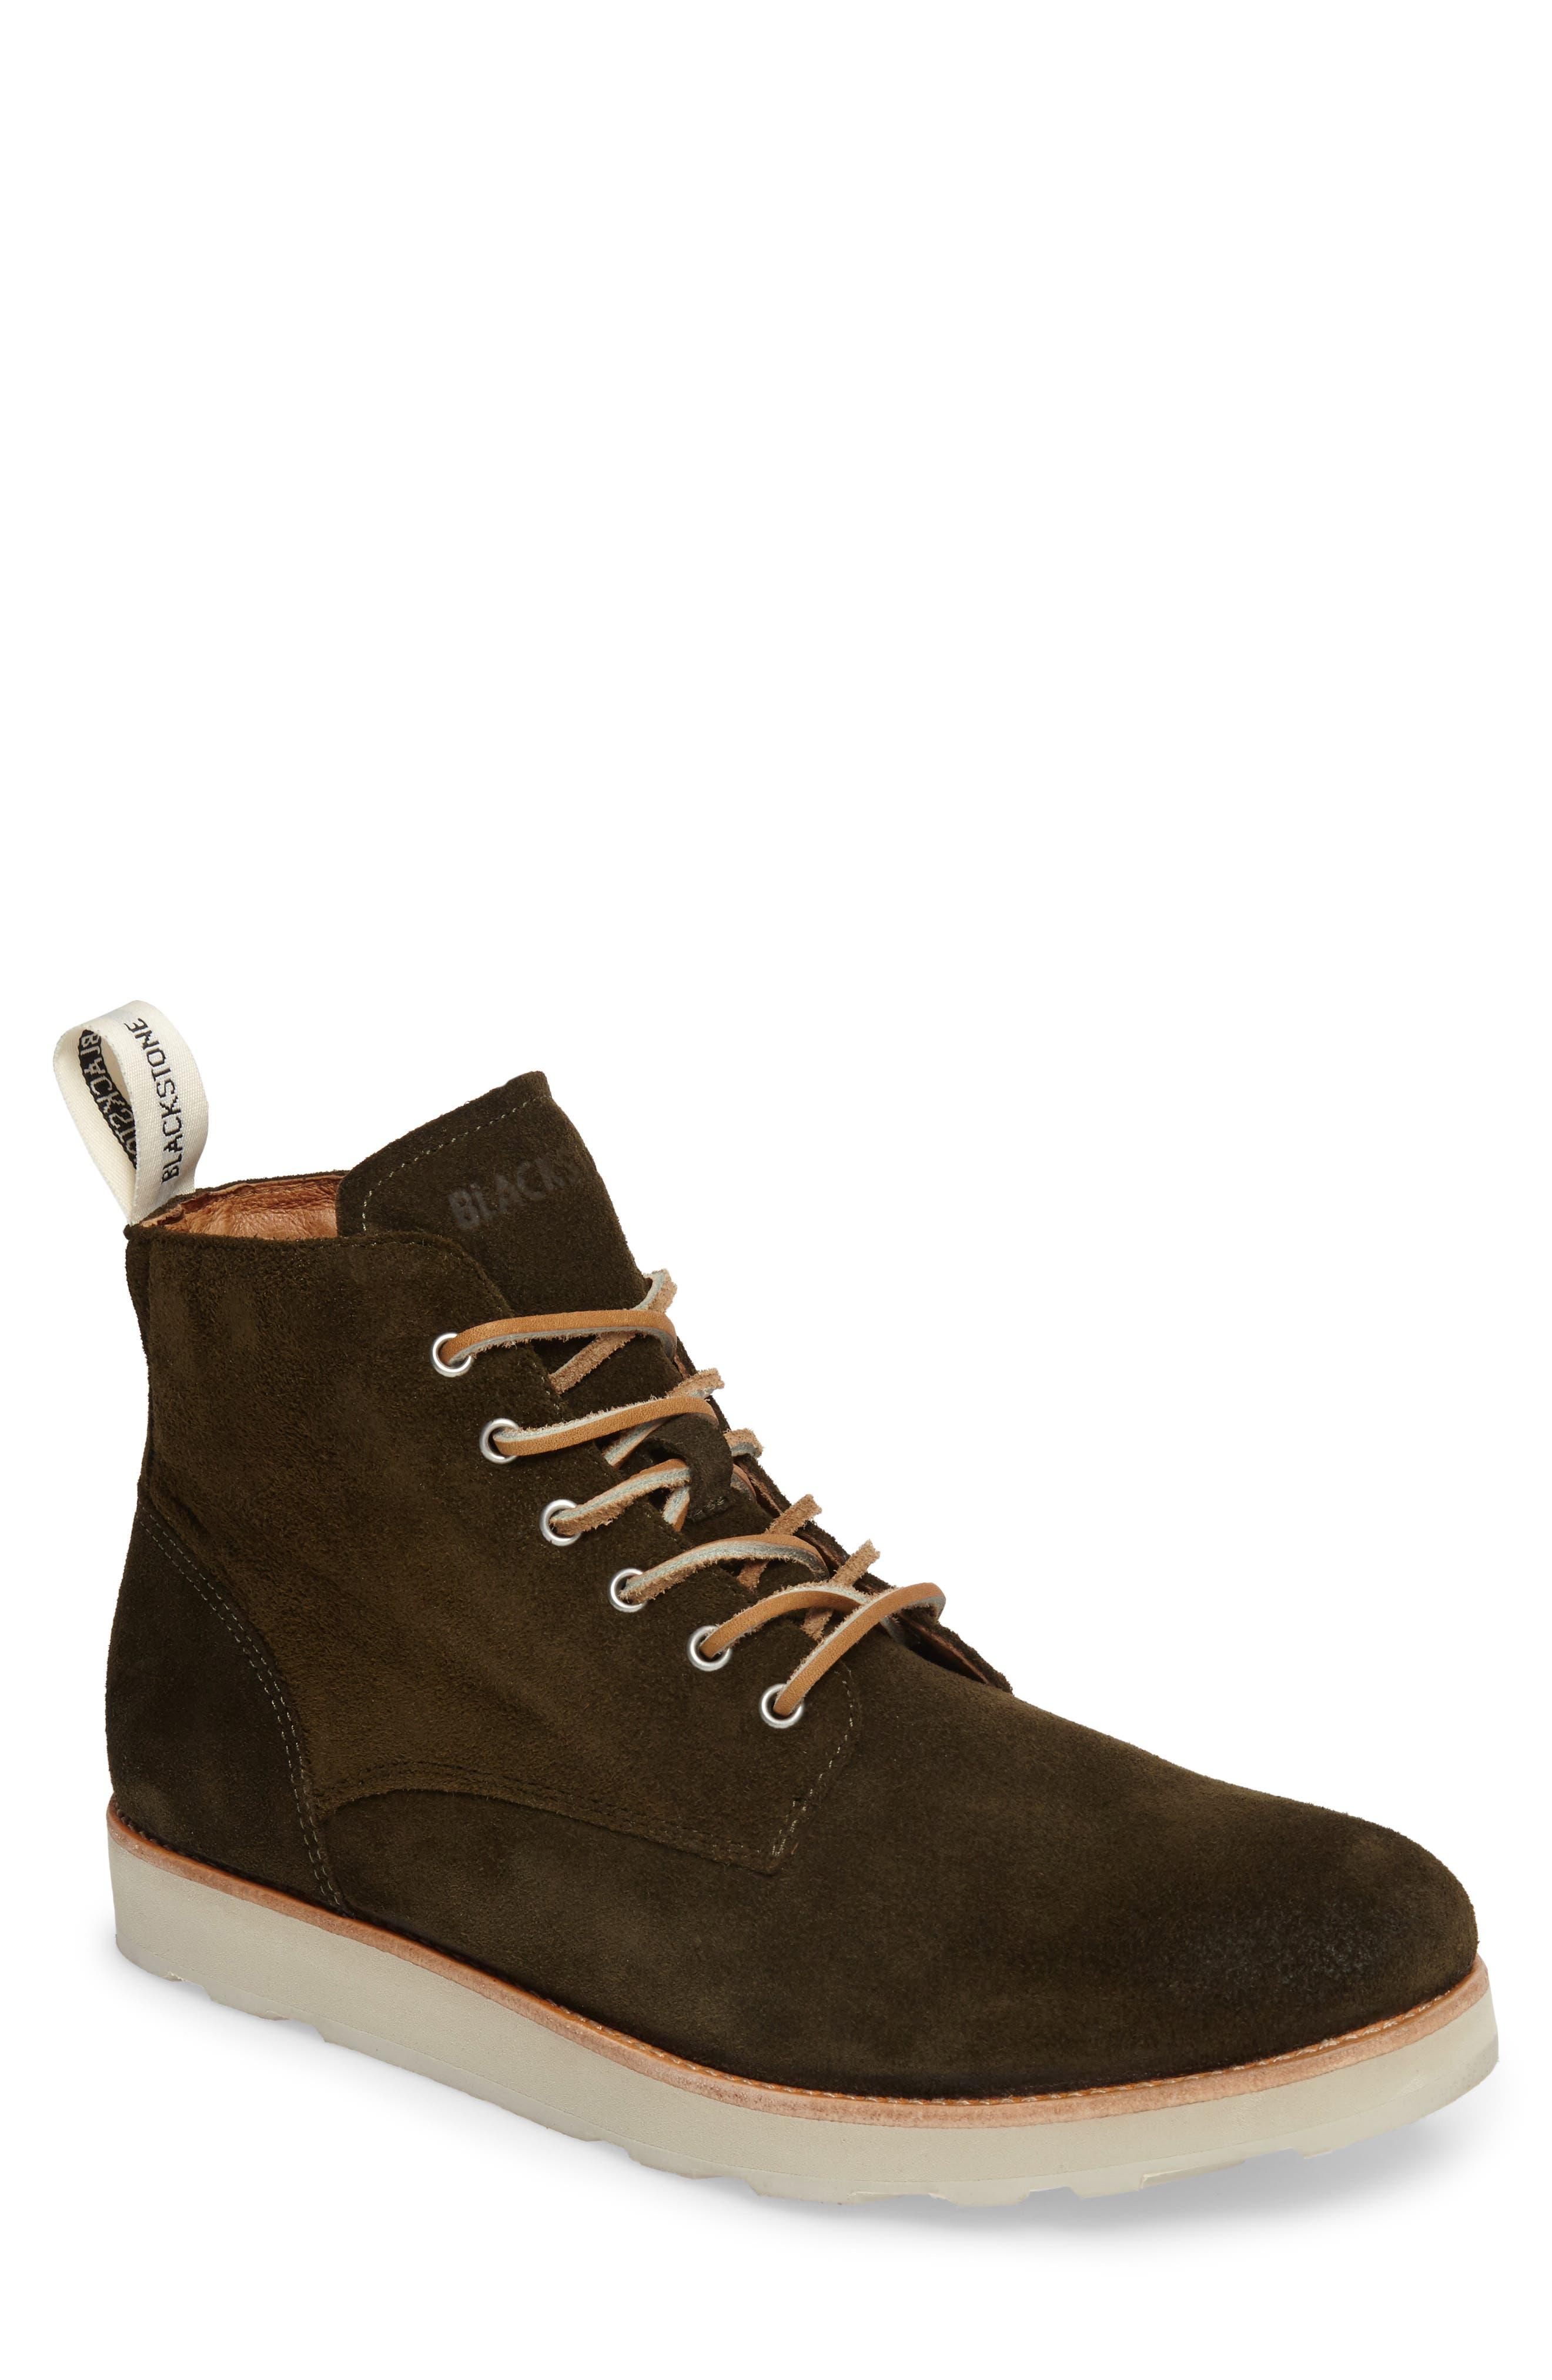 Blackstone Om 53 Plain Toe Boot, Green